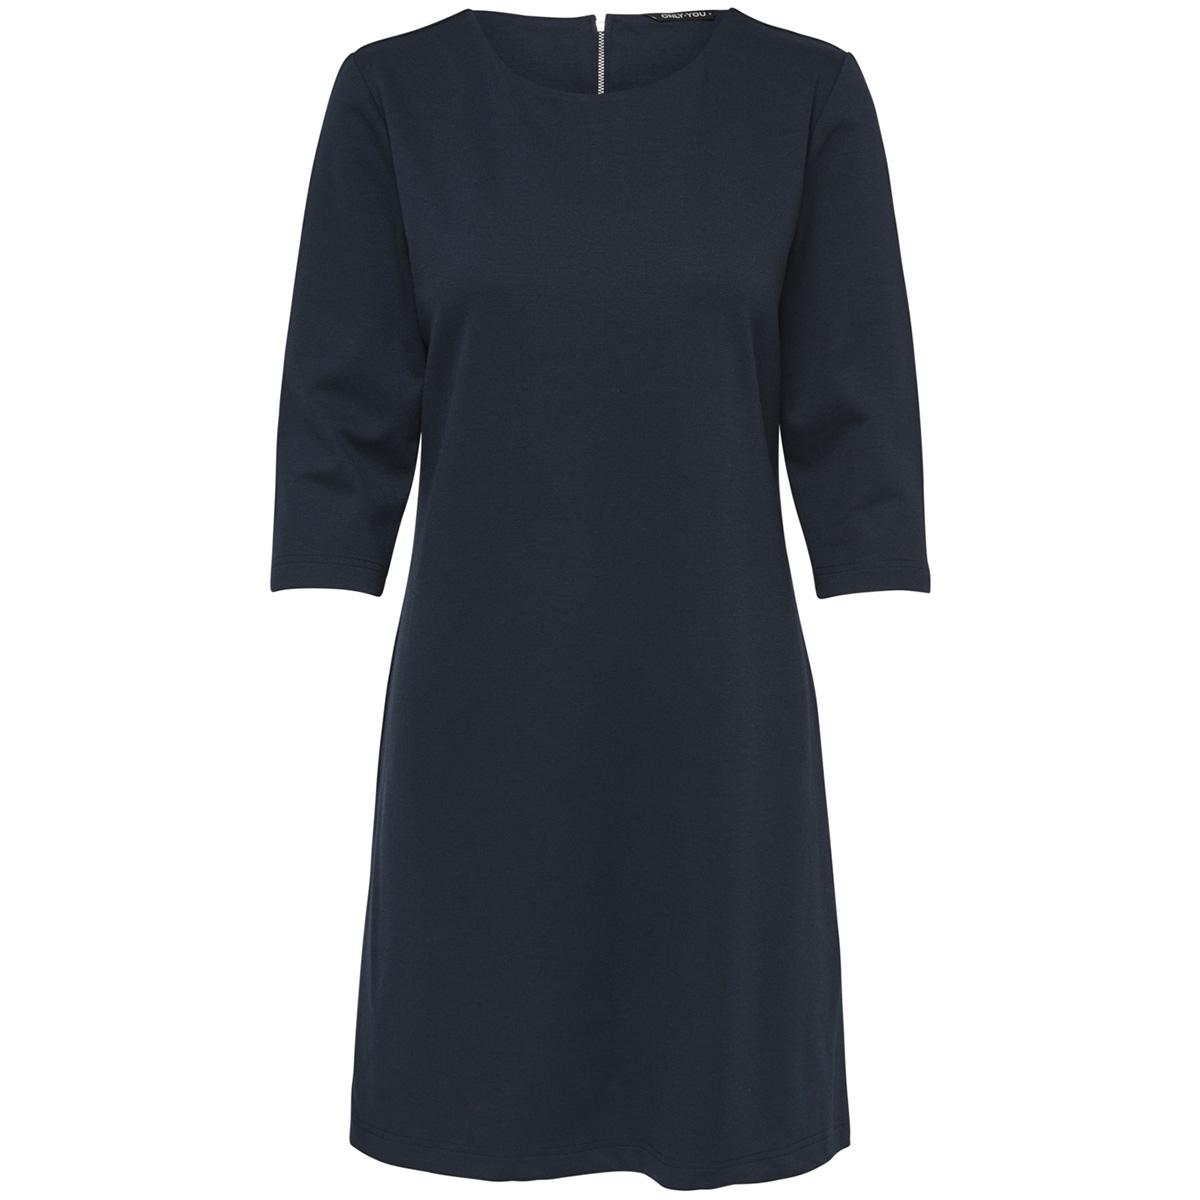 onybrendan 3/4 dress jrs 15178090 only jurk night sky